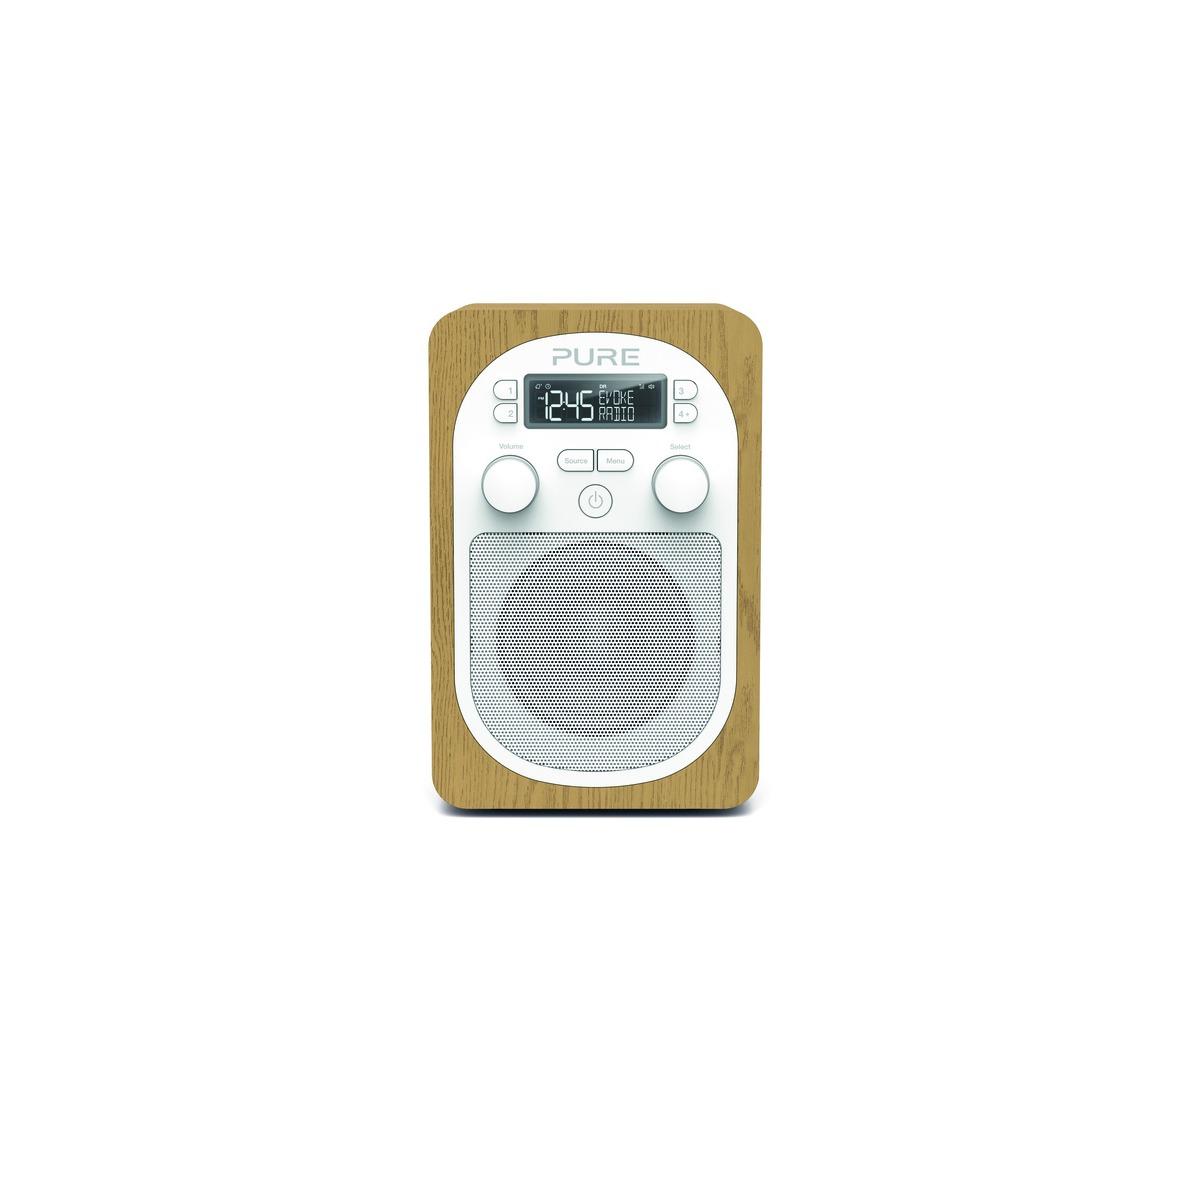 Pure dab radio EVOKE H2 eiken